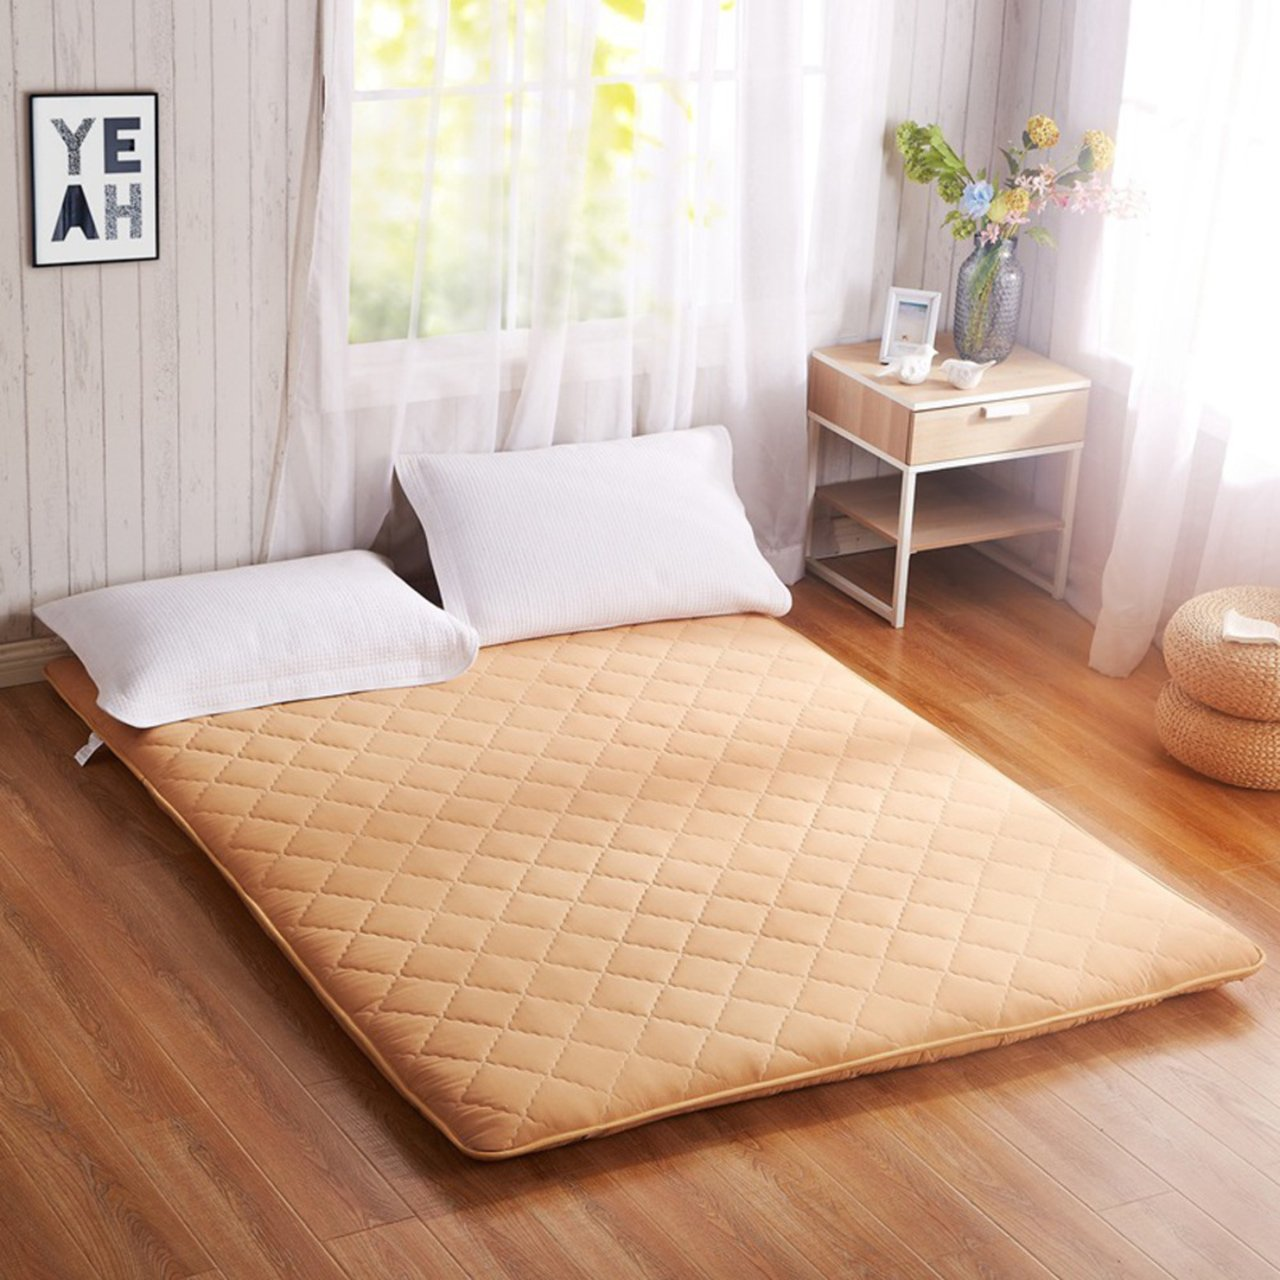 Yellow star Double tatami mattress, Student dorm futon mattress topper portable sleeping pad non-slip floor mat quilted foldable cushion mats-yellow 90x200cm(35x79inch)